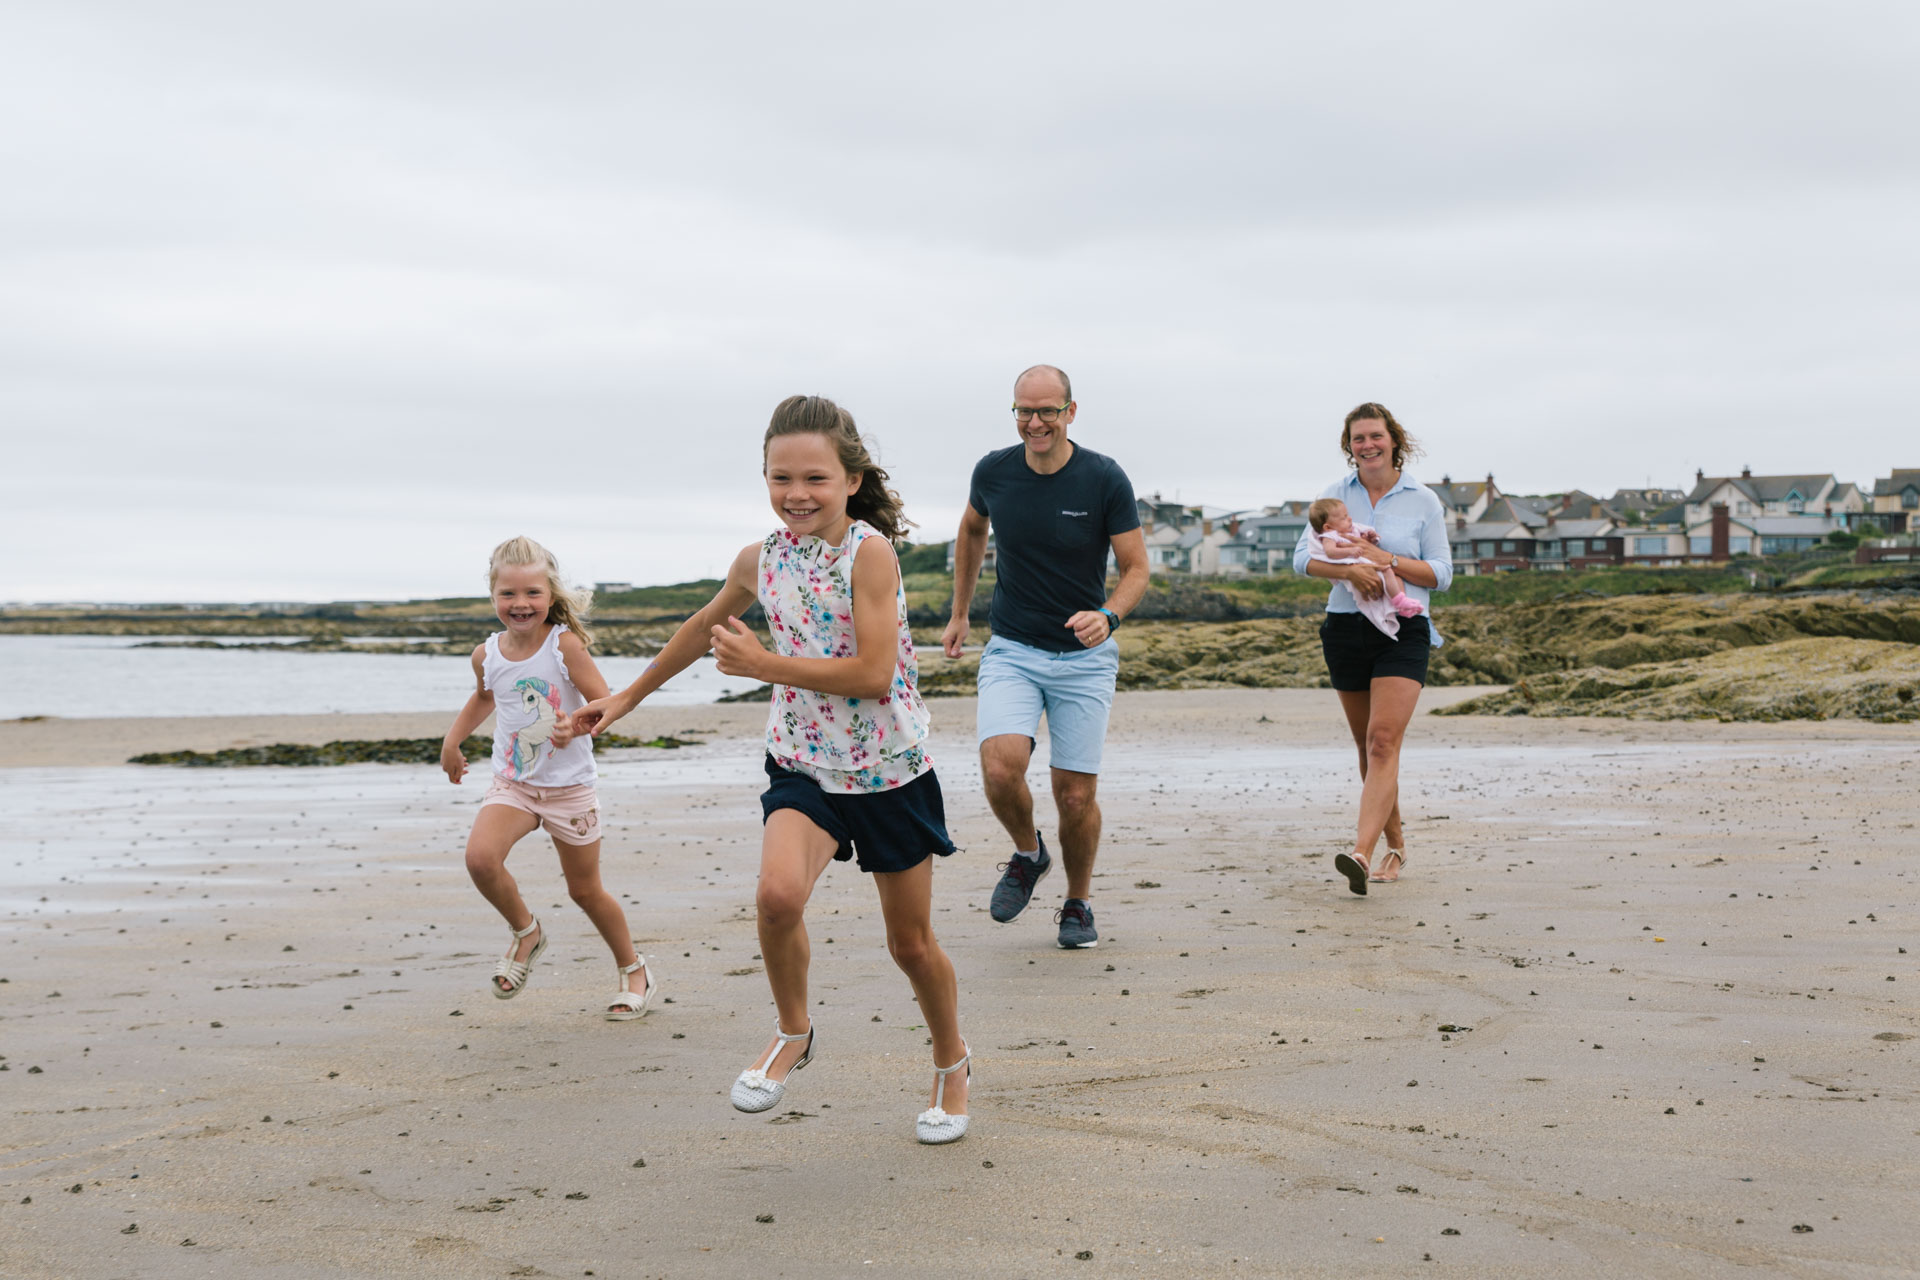 Children Family Photography by Ricky Parker Photography 28